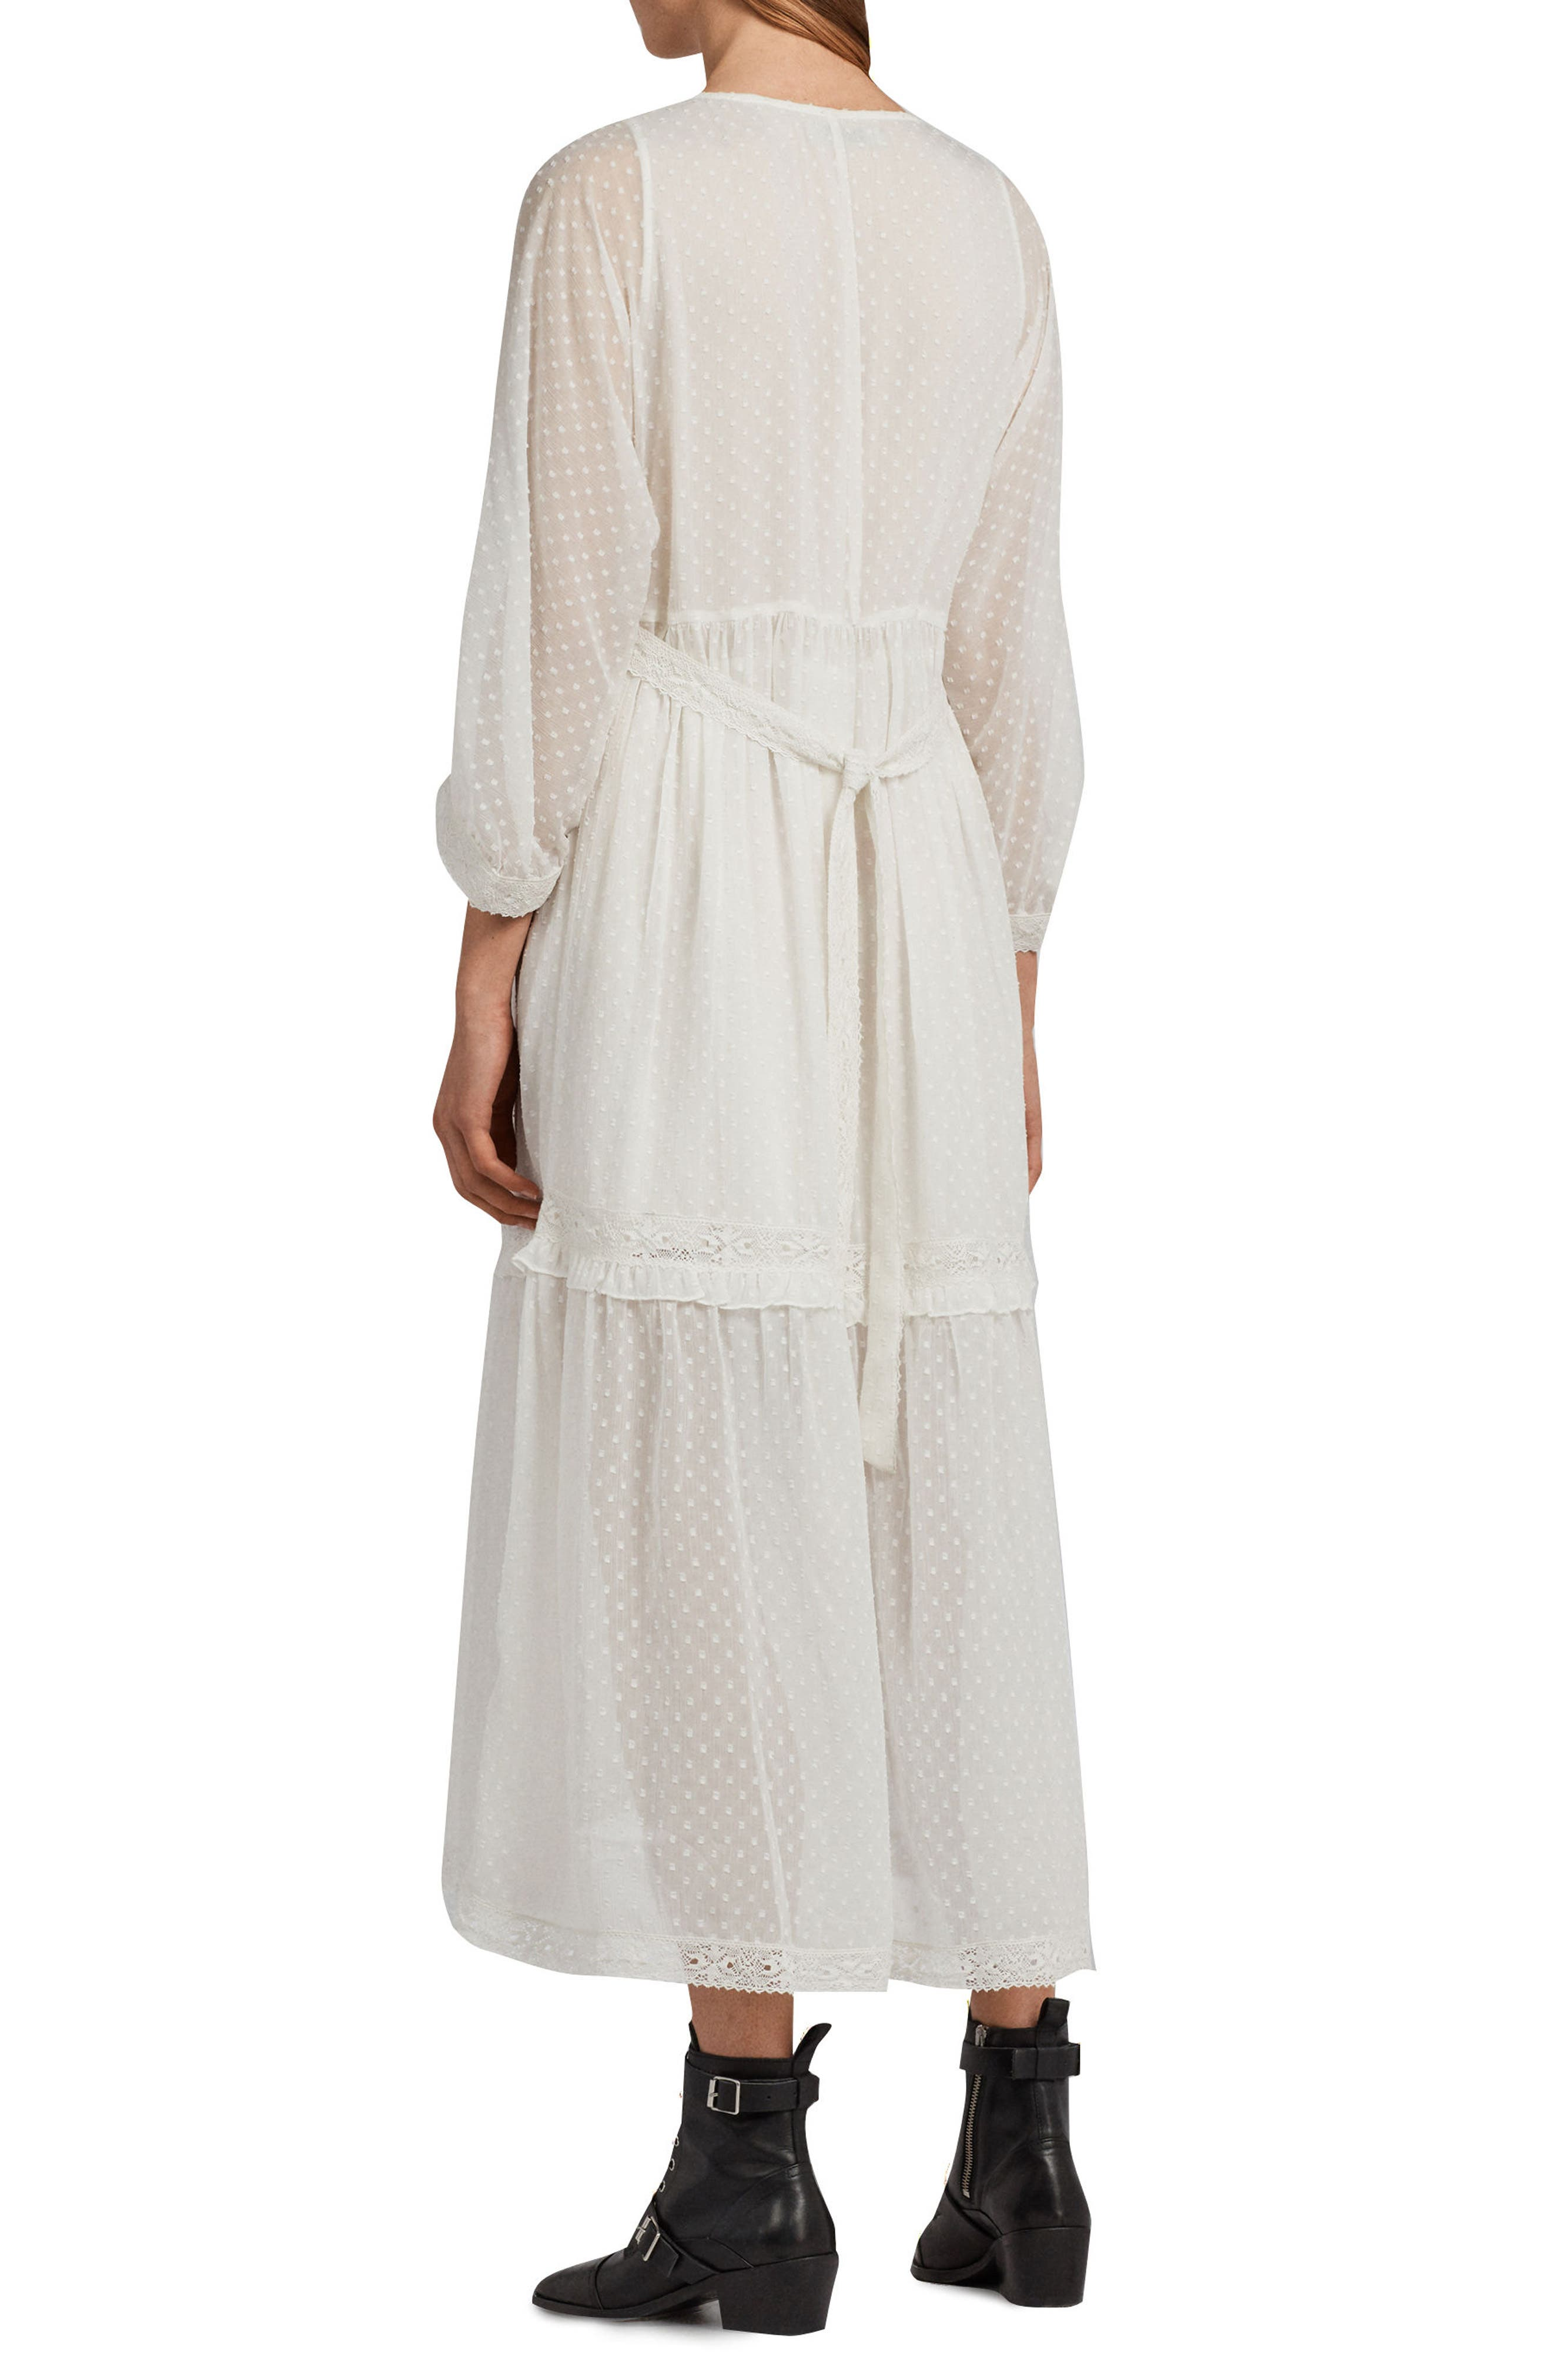 Palma Polka Dot Dress,                             Alternate thumbnail 2, color,                             Chalk White